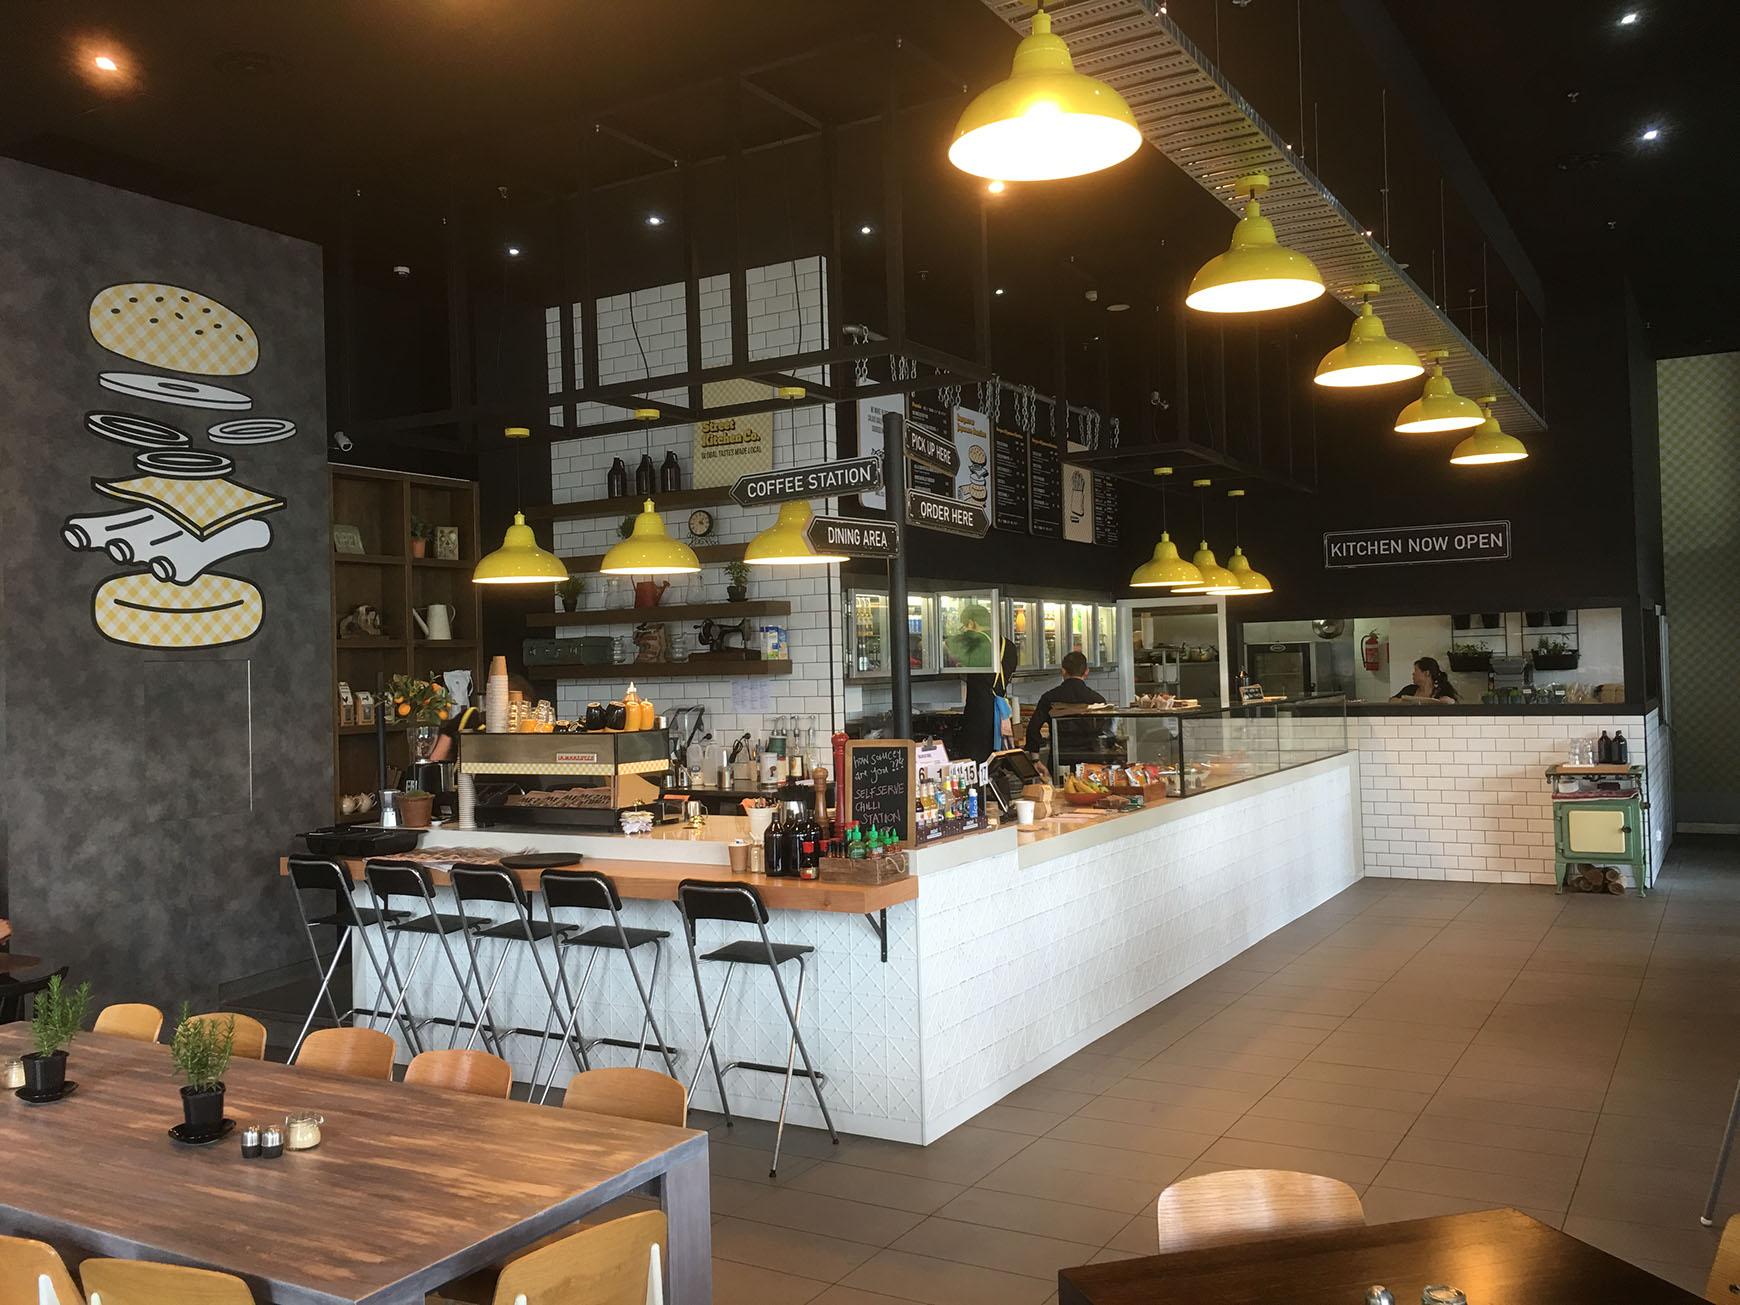 Toothpicks Creative Interior Design Cafe Melbourne